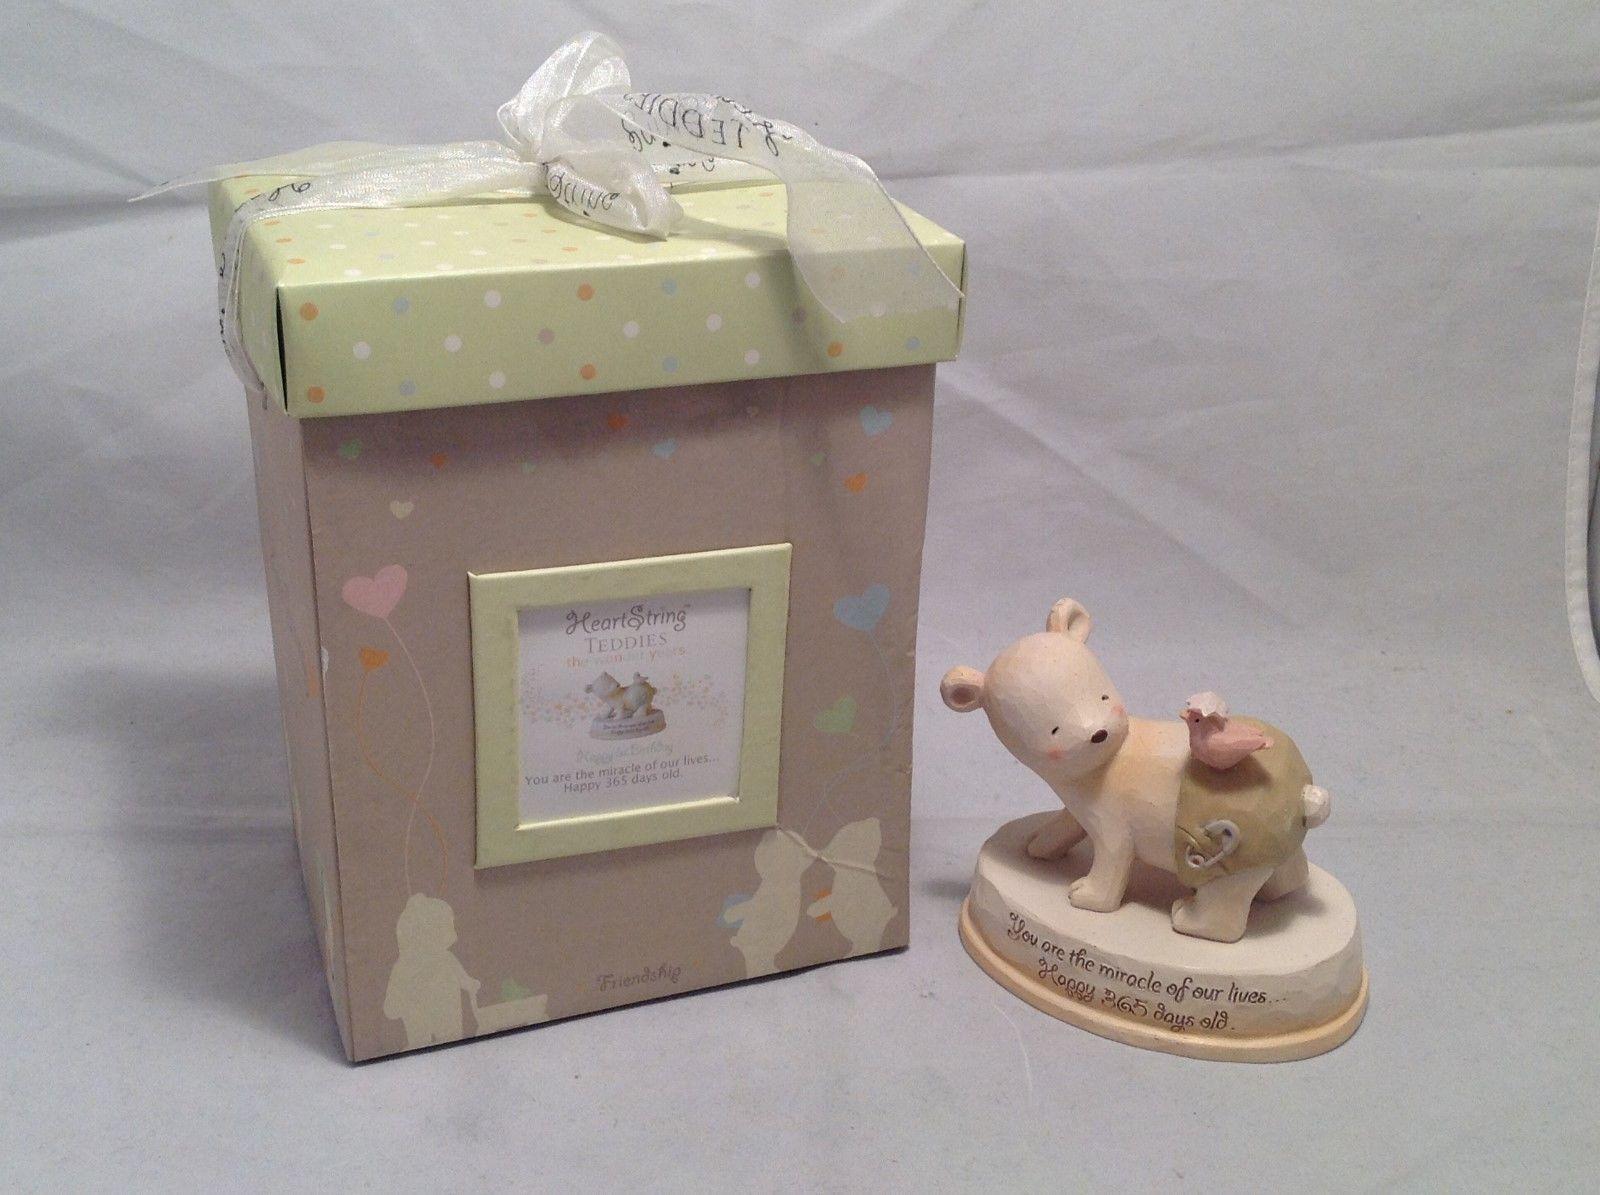 New In Box Heartstring Teddies Happy First Birthday Figurine